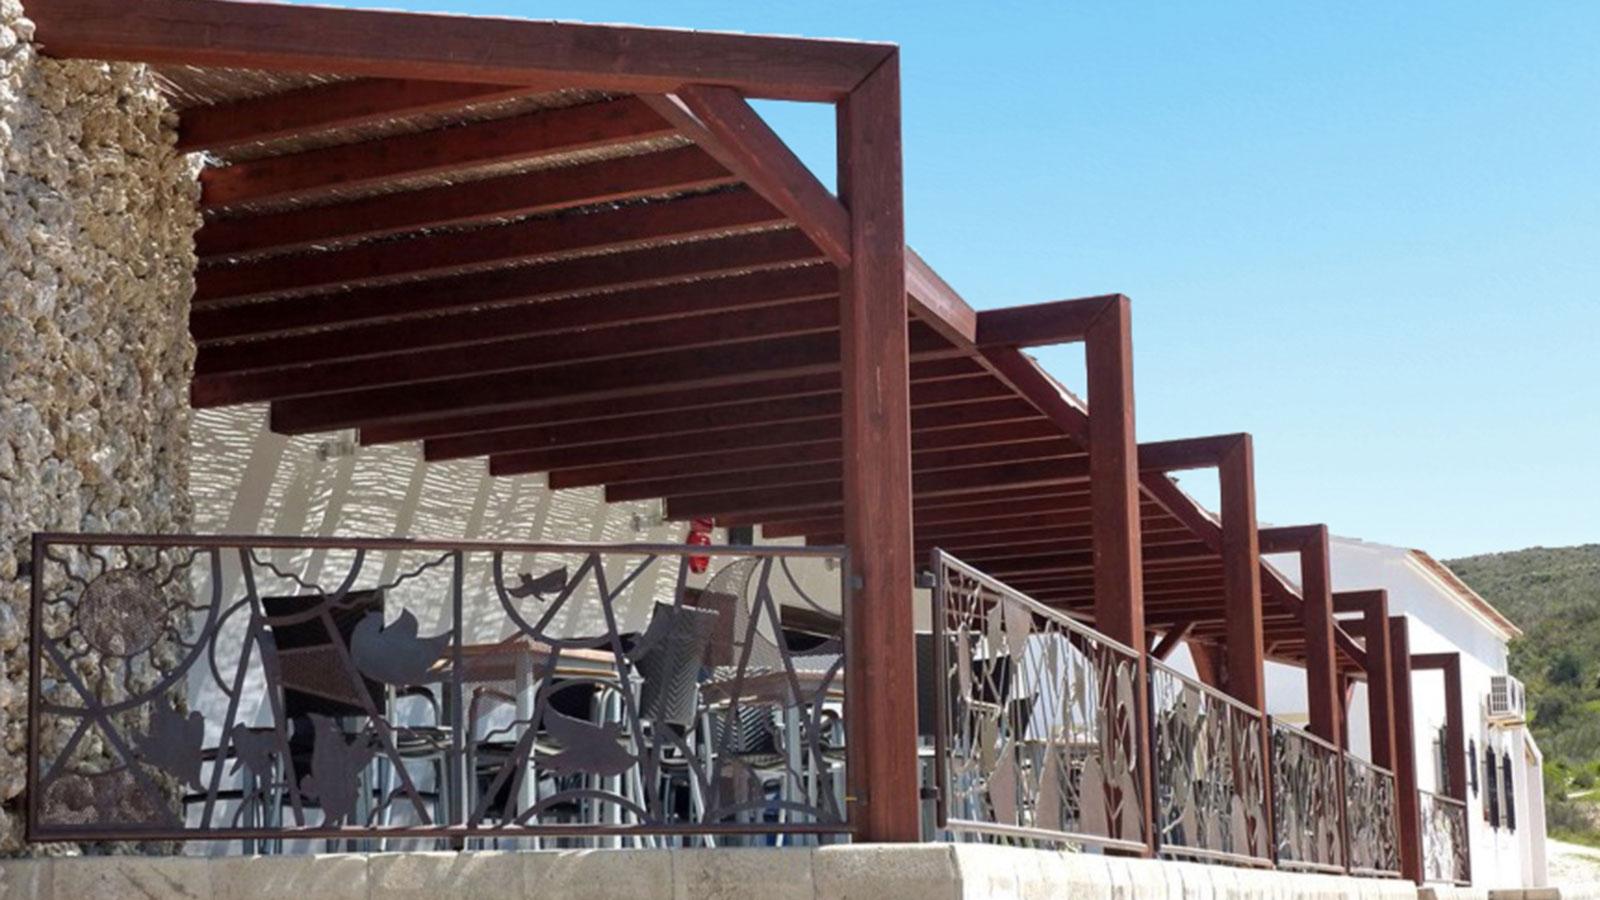 Pergolas de madera para terrazas benoit roubaud - Pergolas de madera para terrazas ...